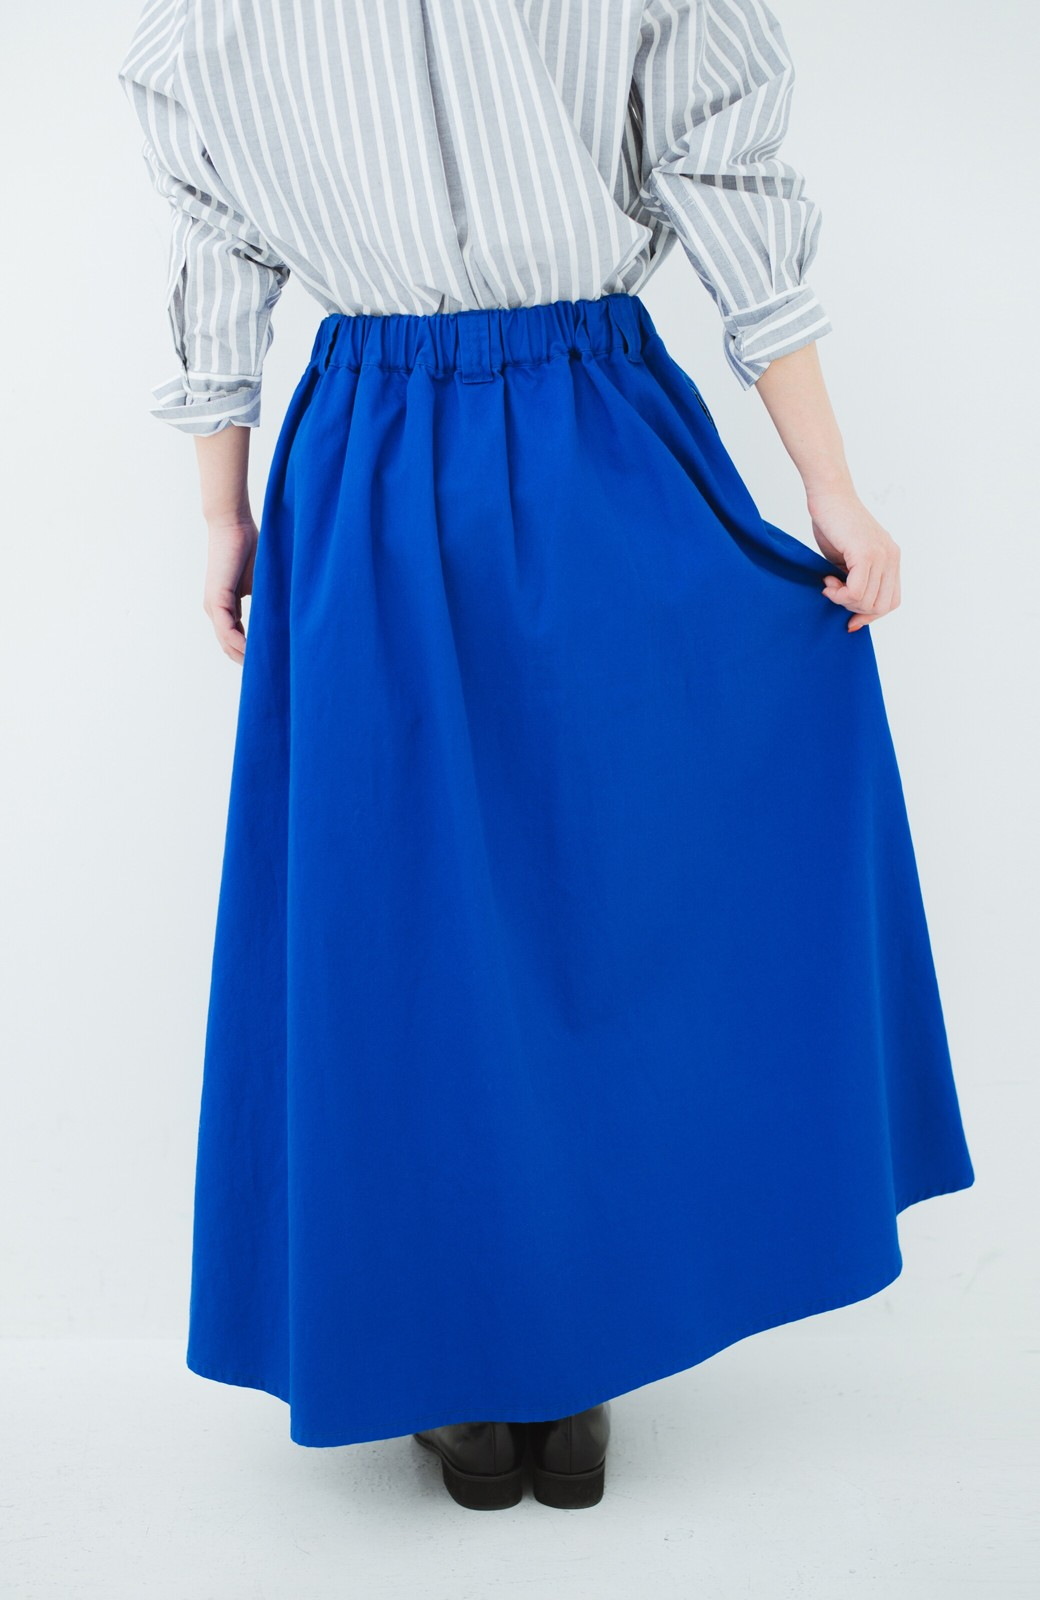 haco! 【今年も再販!】ロングシーズン楽しめる タックボリュームのチノロングスカート <ブルー>の商品写真6